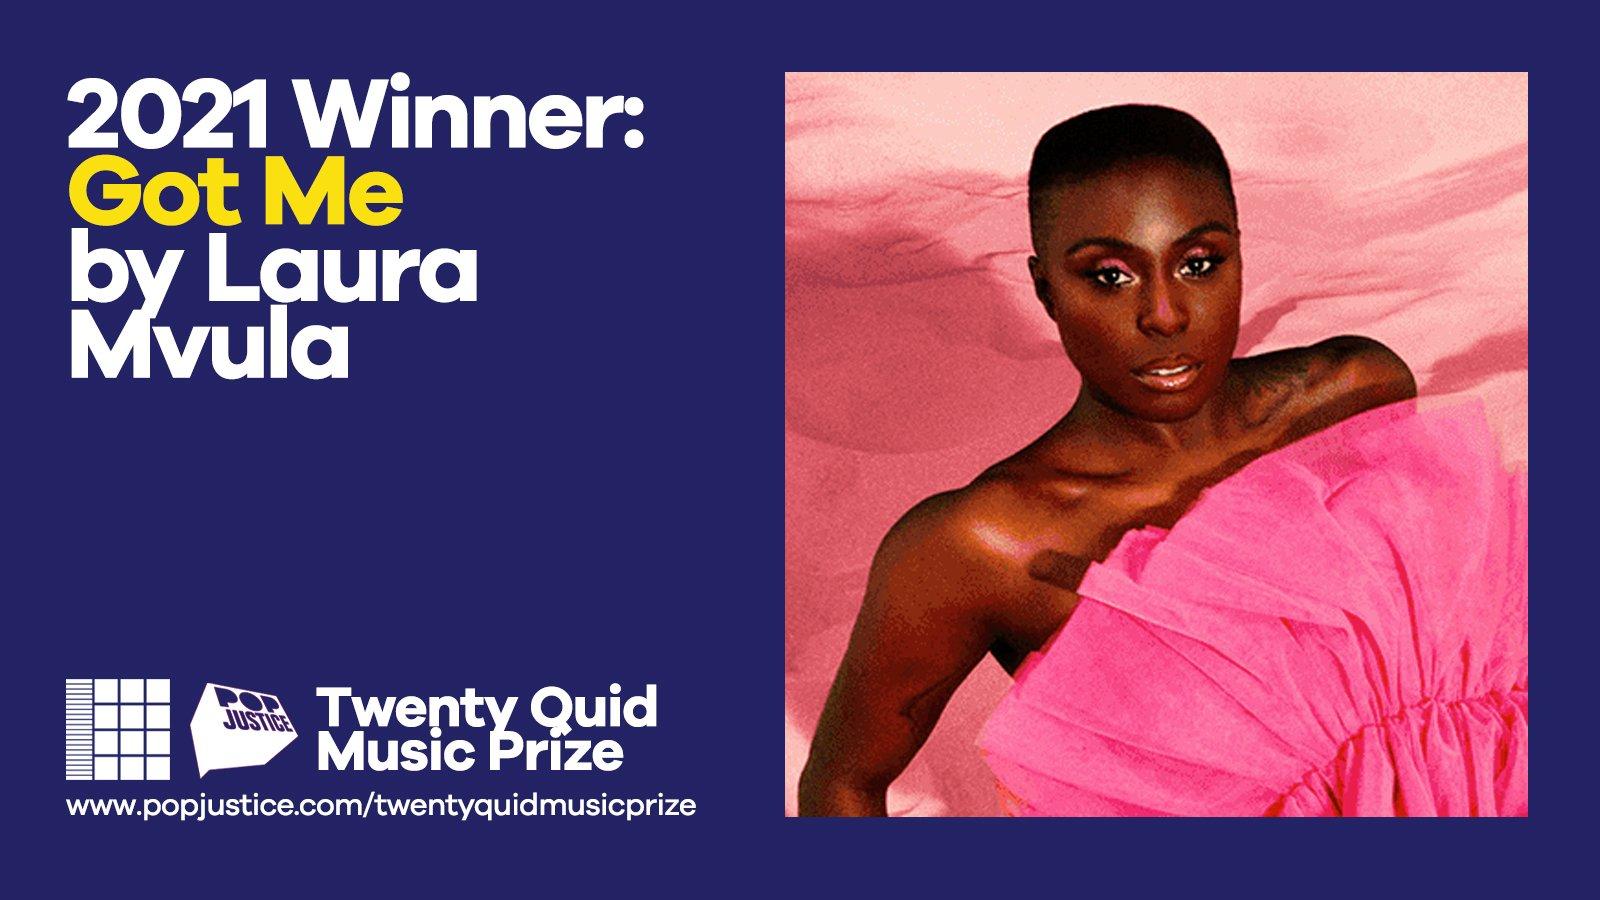 2021 Popjustice Twenty Quid Music Prize: Laura Mvula wins